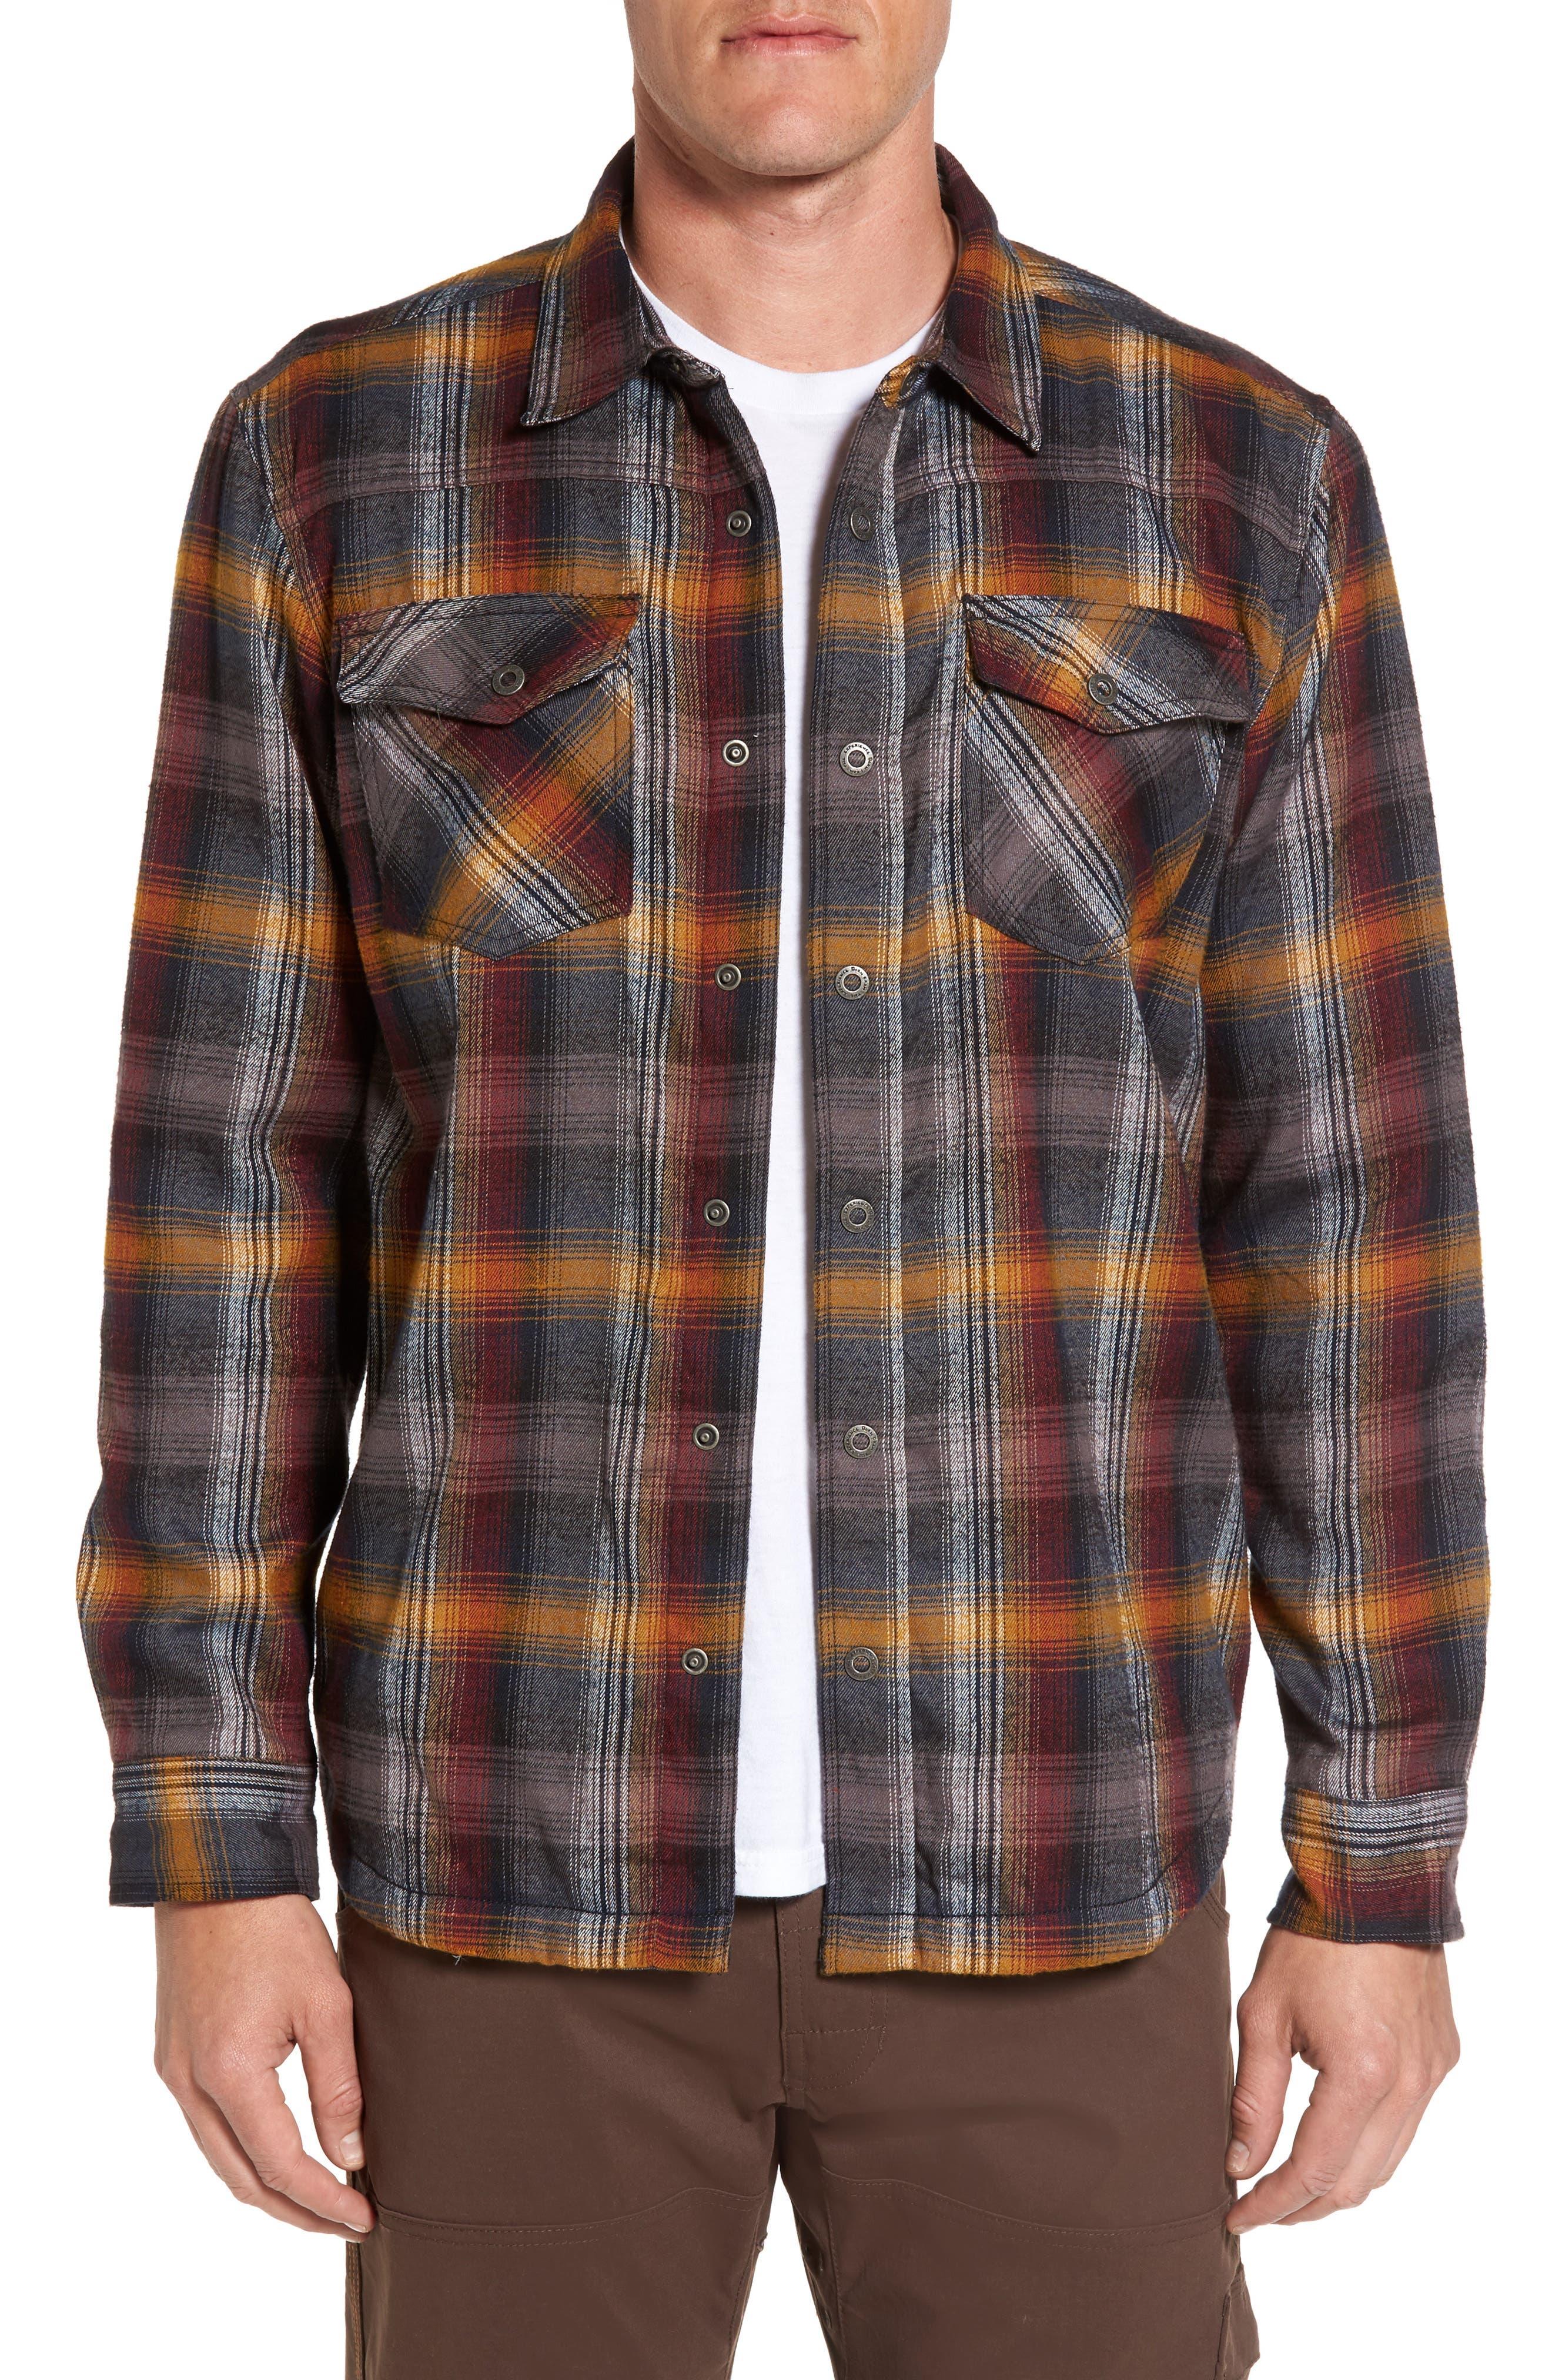 Asylum Regular Fit Plaid Shirt Jacket,                         Main,                         color, 001